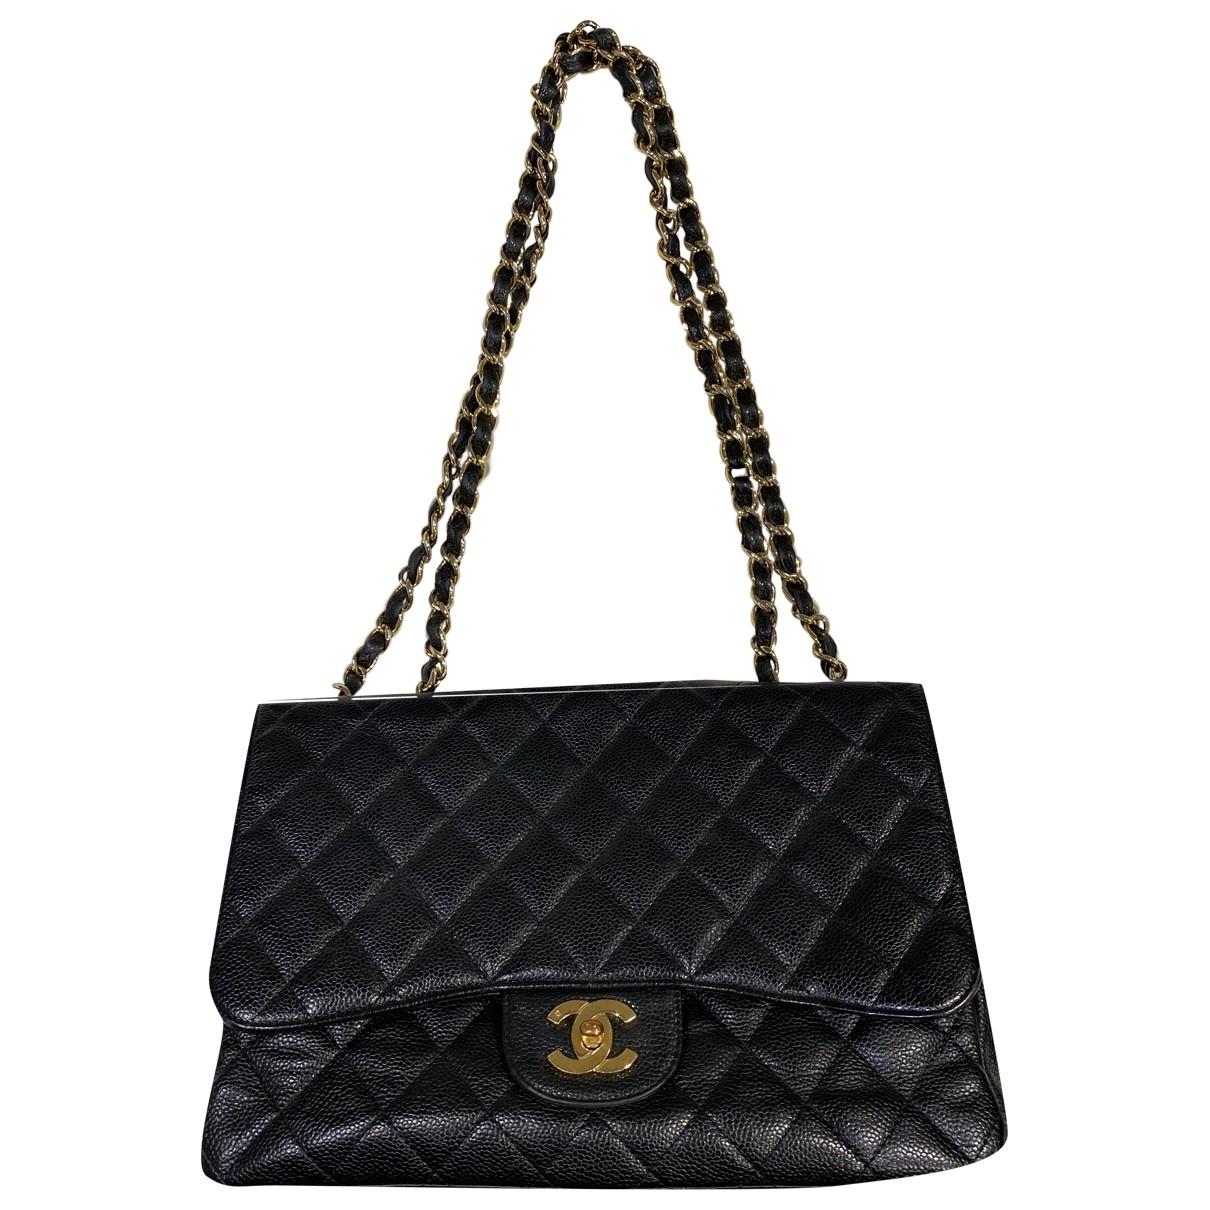 Chanel 2.55 Black Leather handbag for Women N